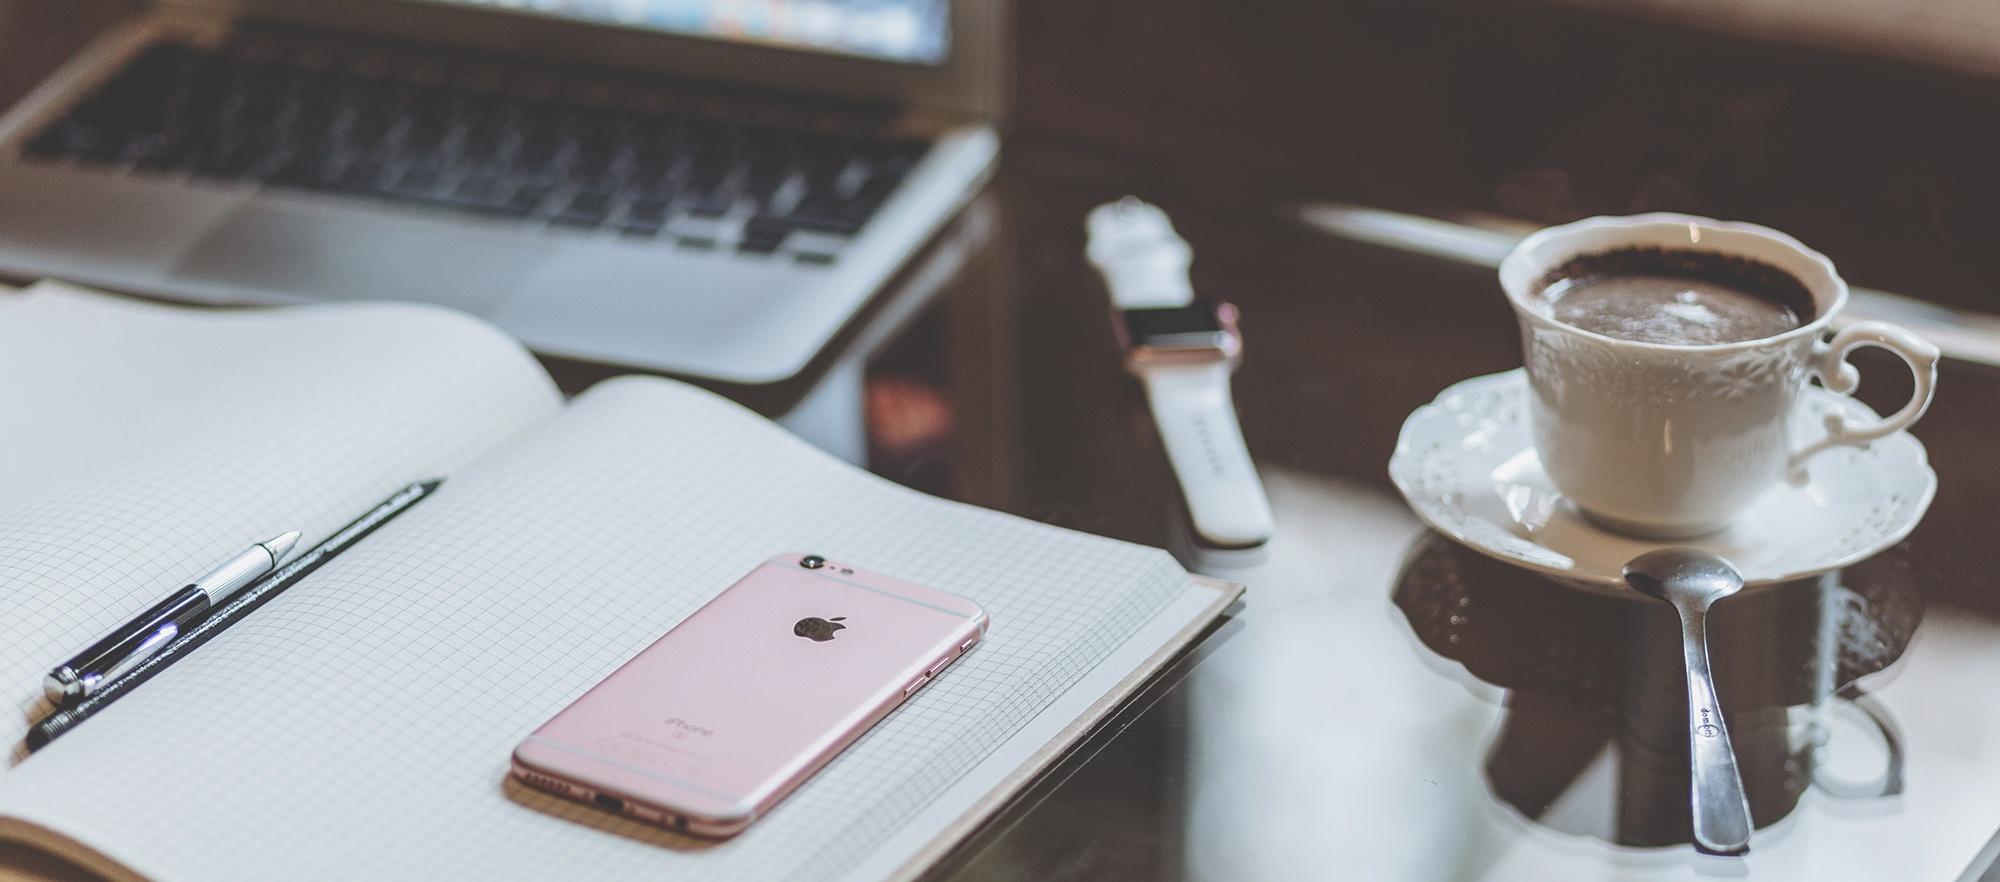 7 productivity hacks that we use everyday